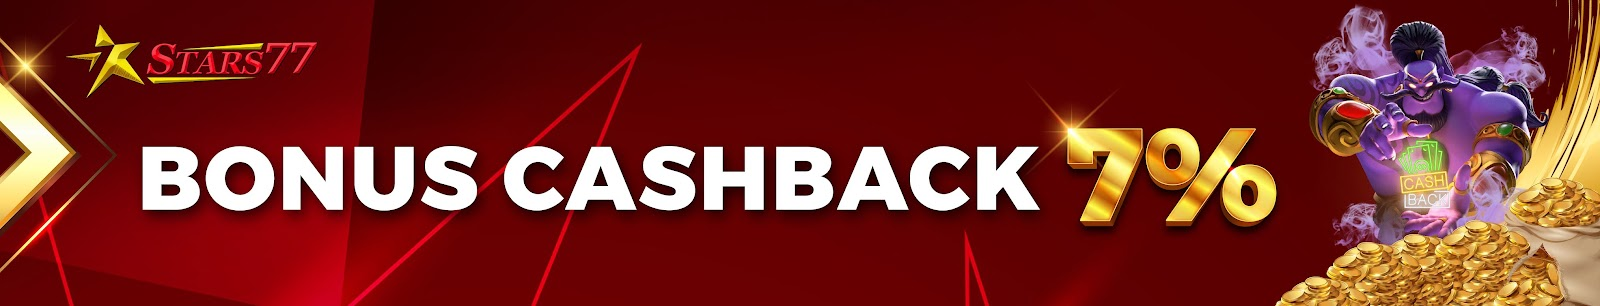 Cashback 7%